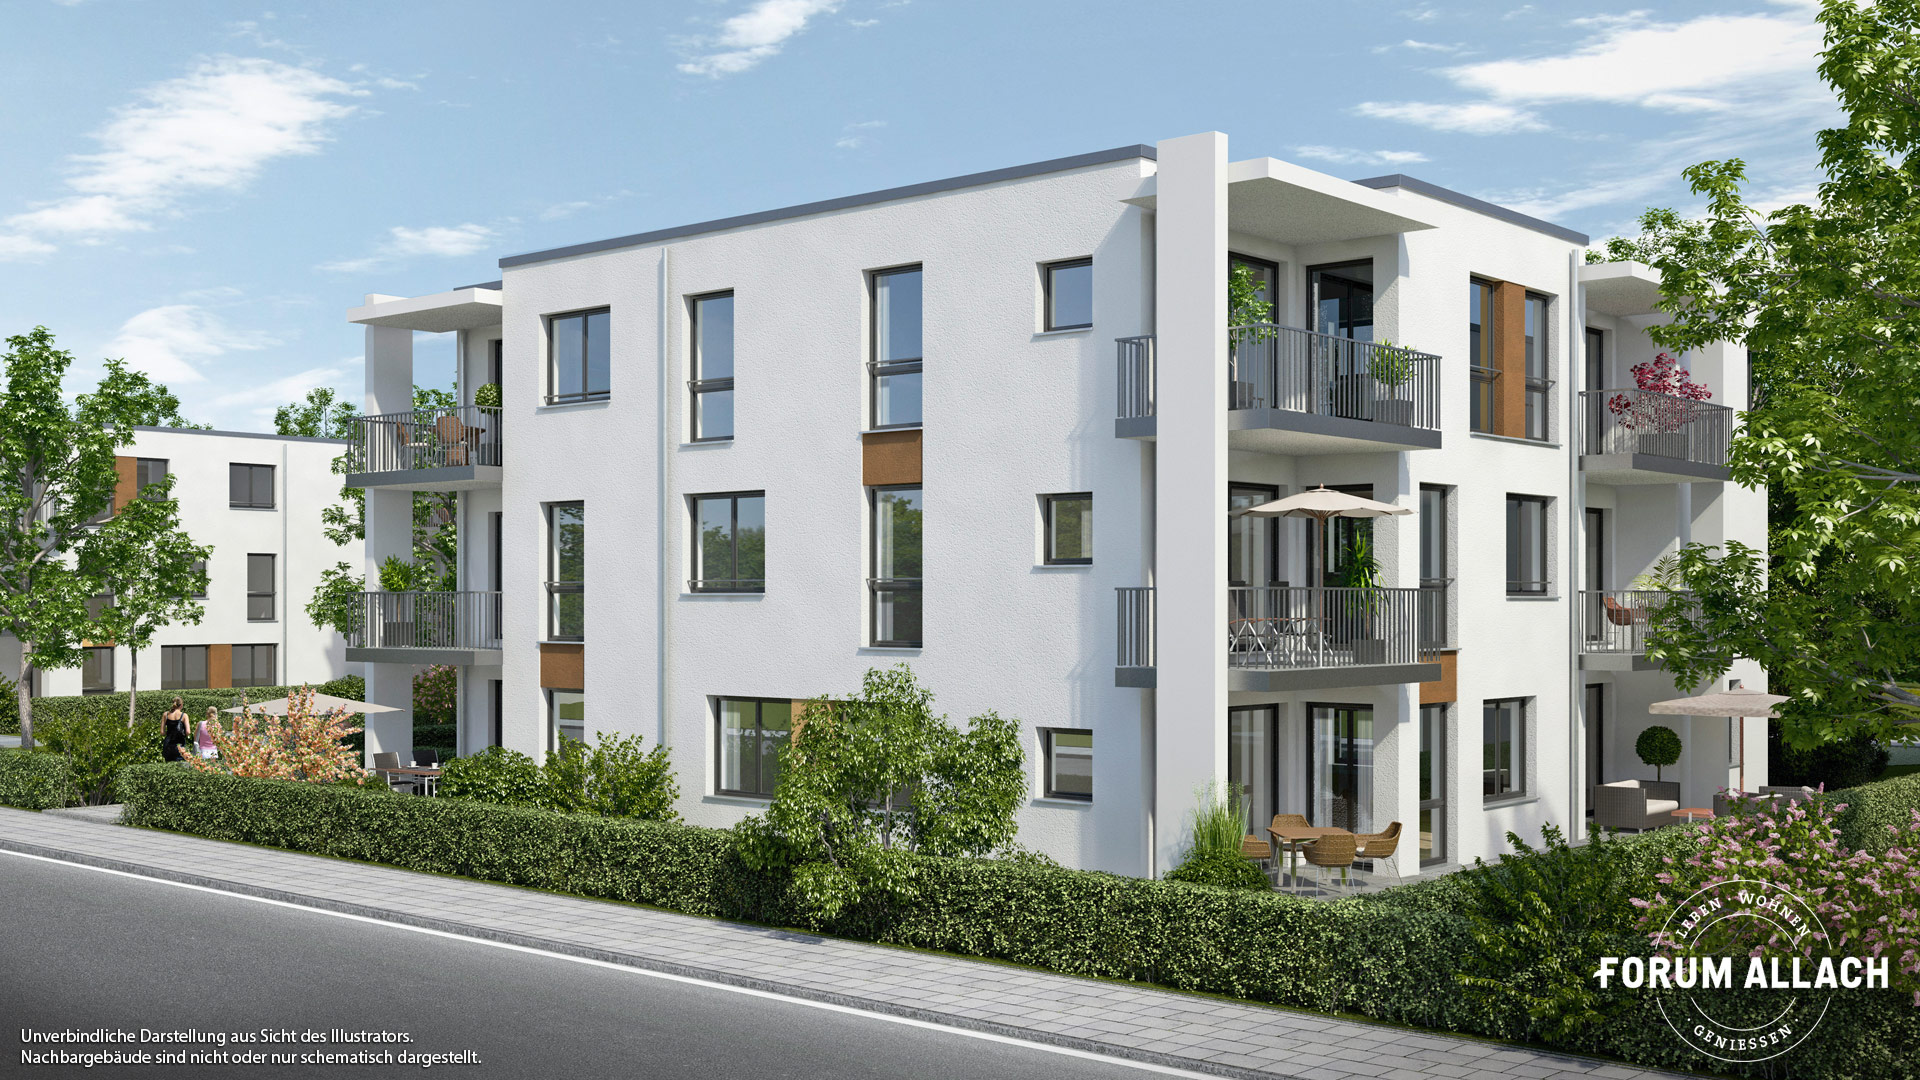 Immobilie Forum Allach - Illustration 3